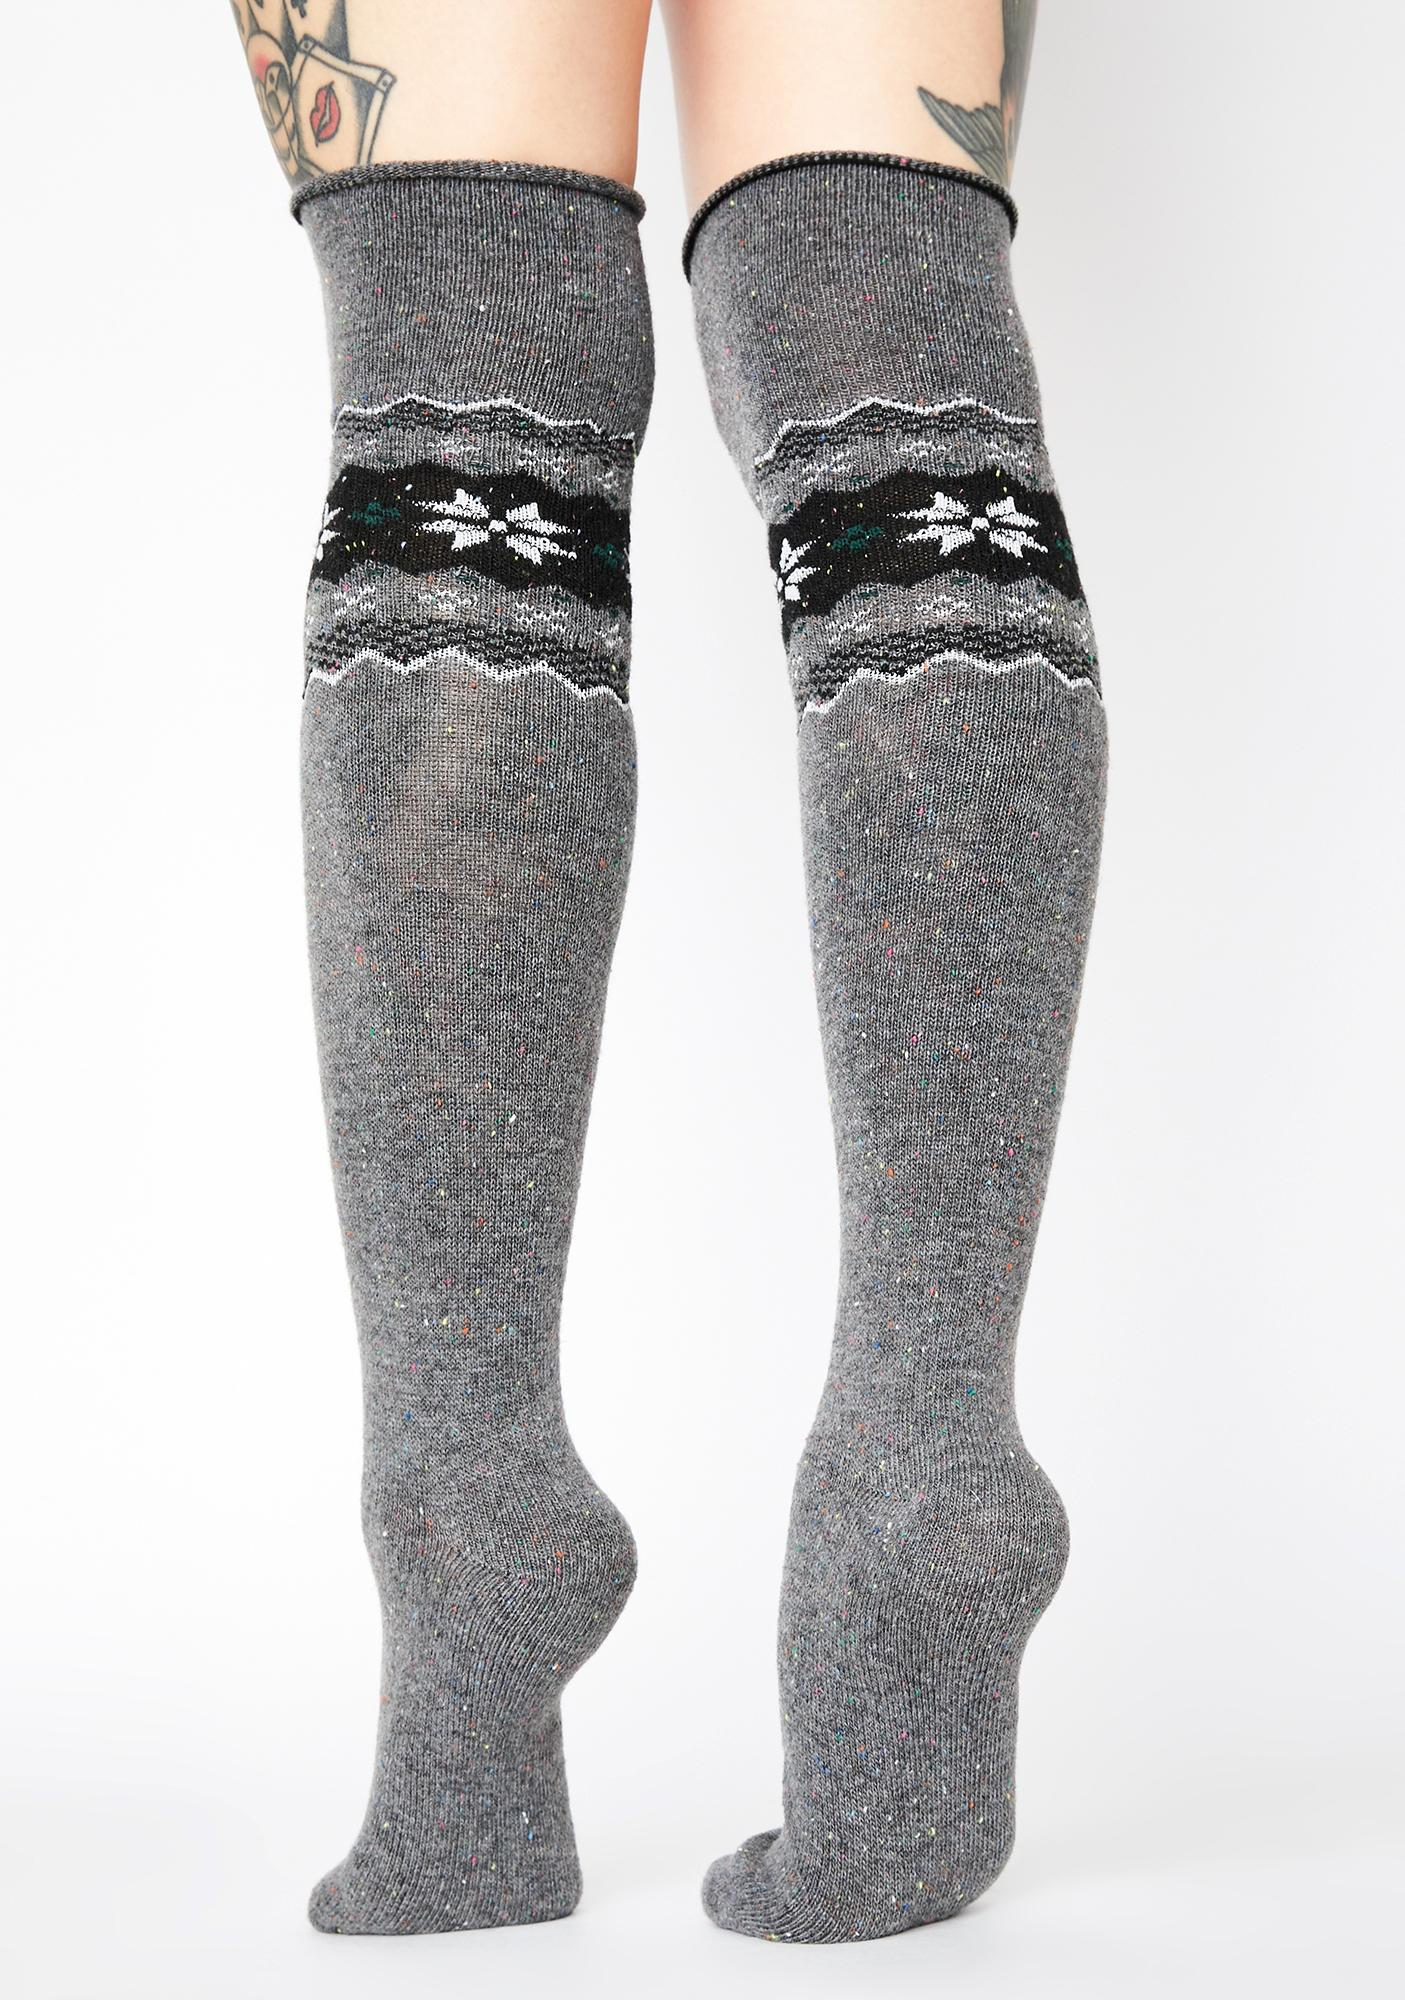 MeMoi Heather Nordic Sparks Over The Knee Socks